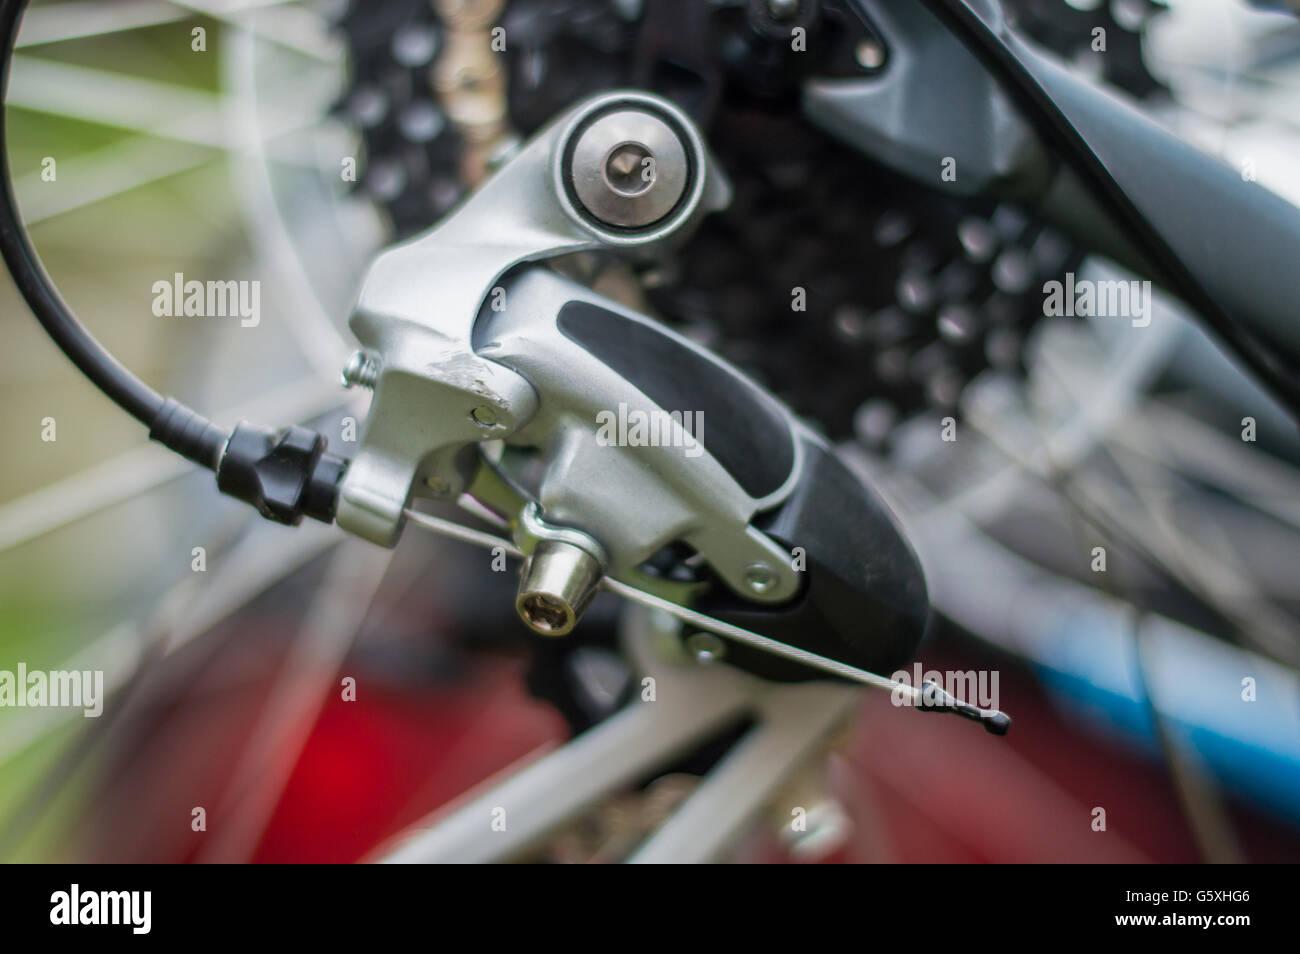 Closeup of a bicycle gear shifting mechanism Stock Photo